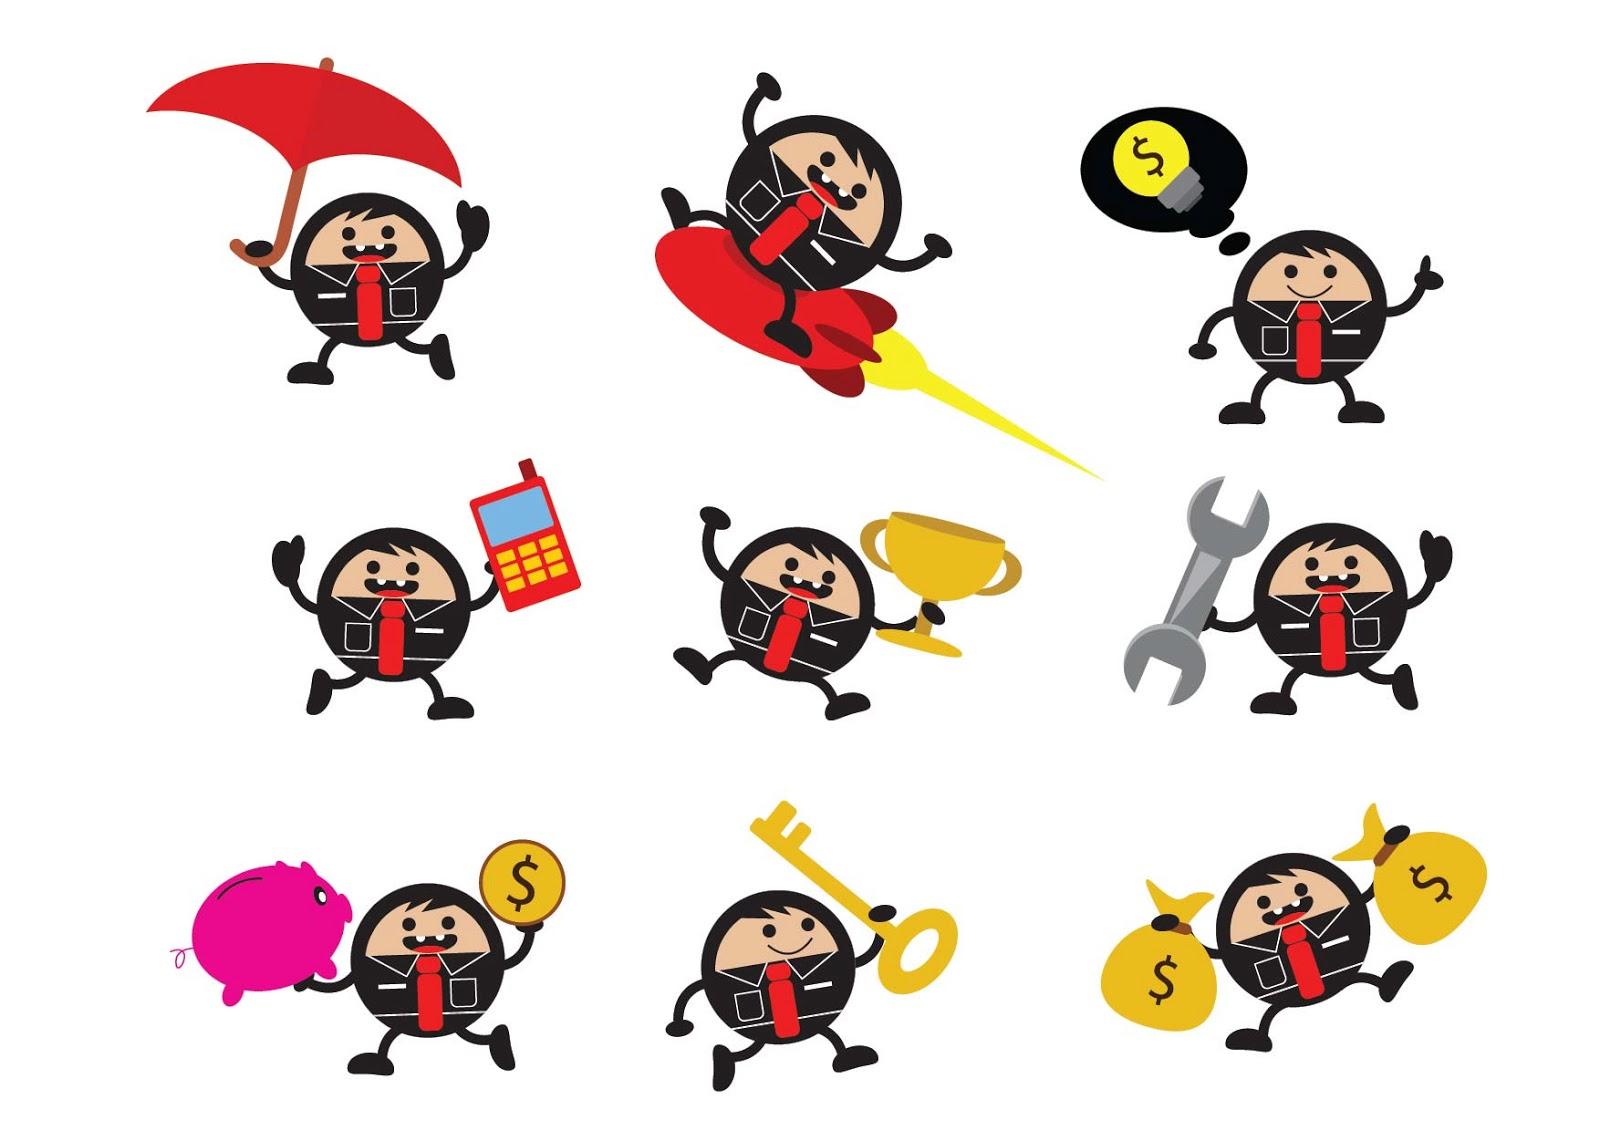 Shirt design layout -  Illustration Vector Graphic Business Businessman Cartoon Character Fun Funny Activities Marketing Presentation Idea Money Save Bank